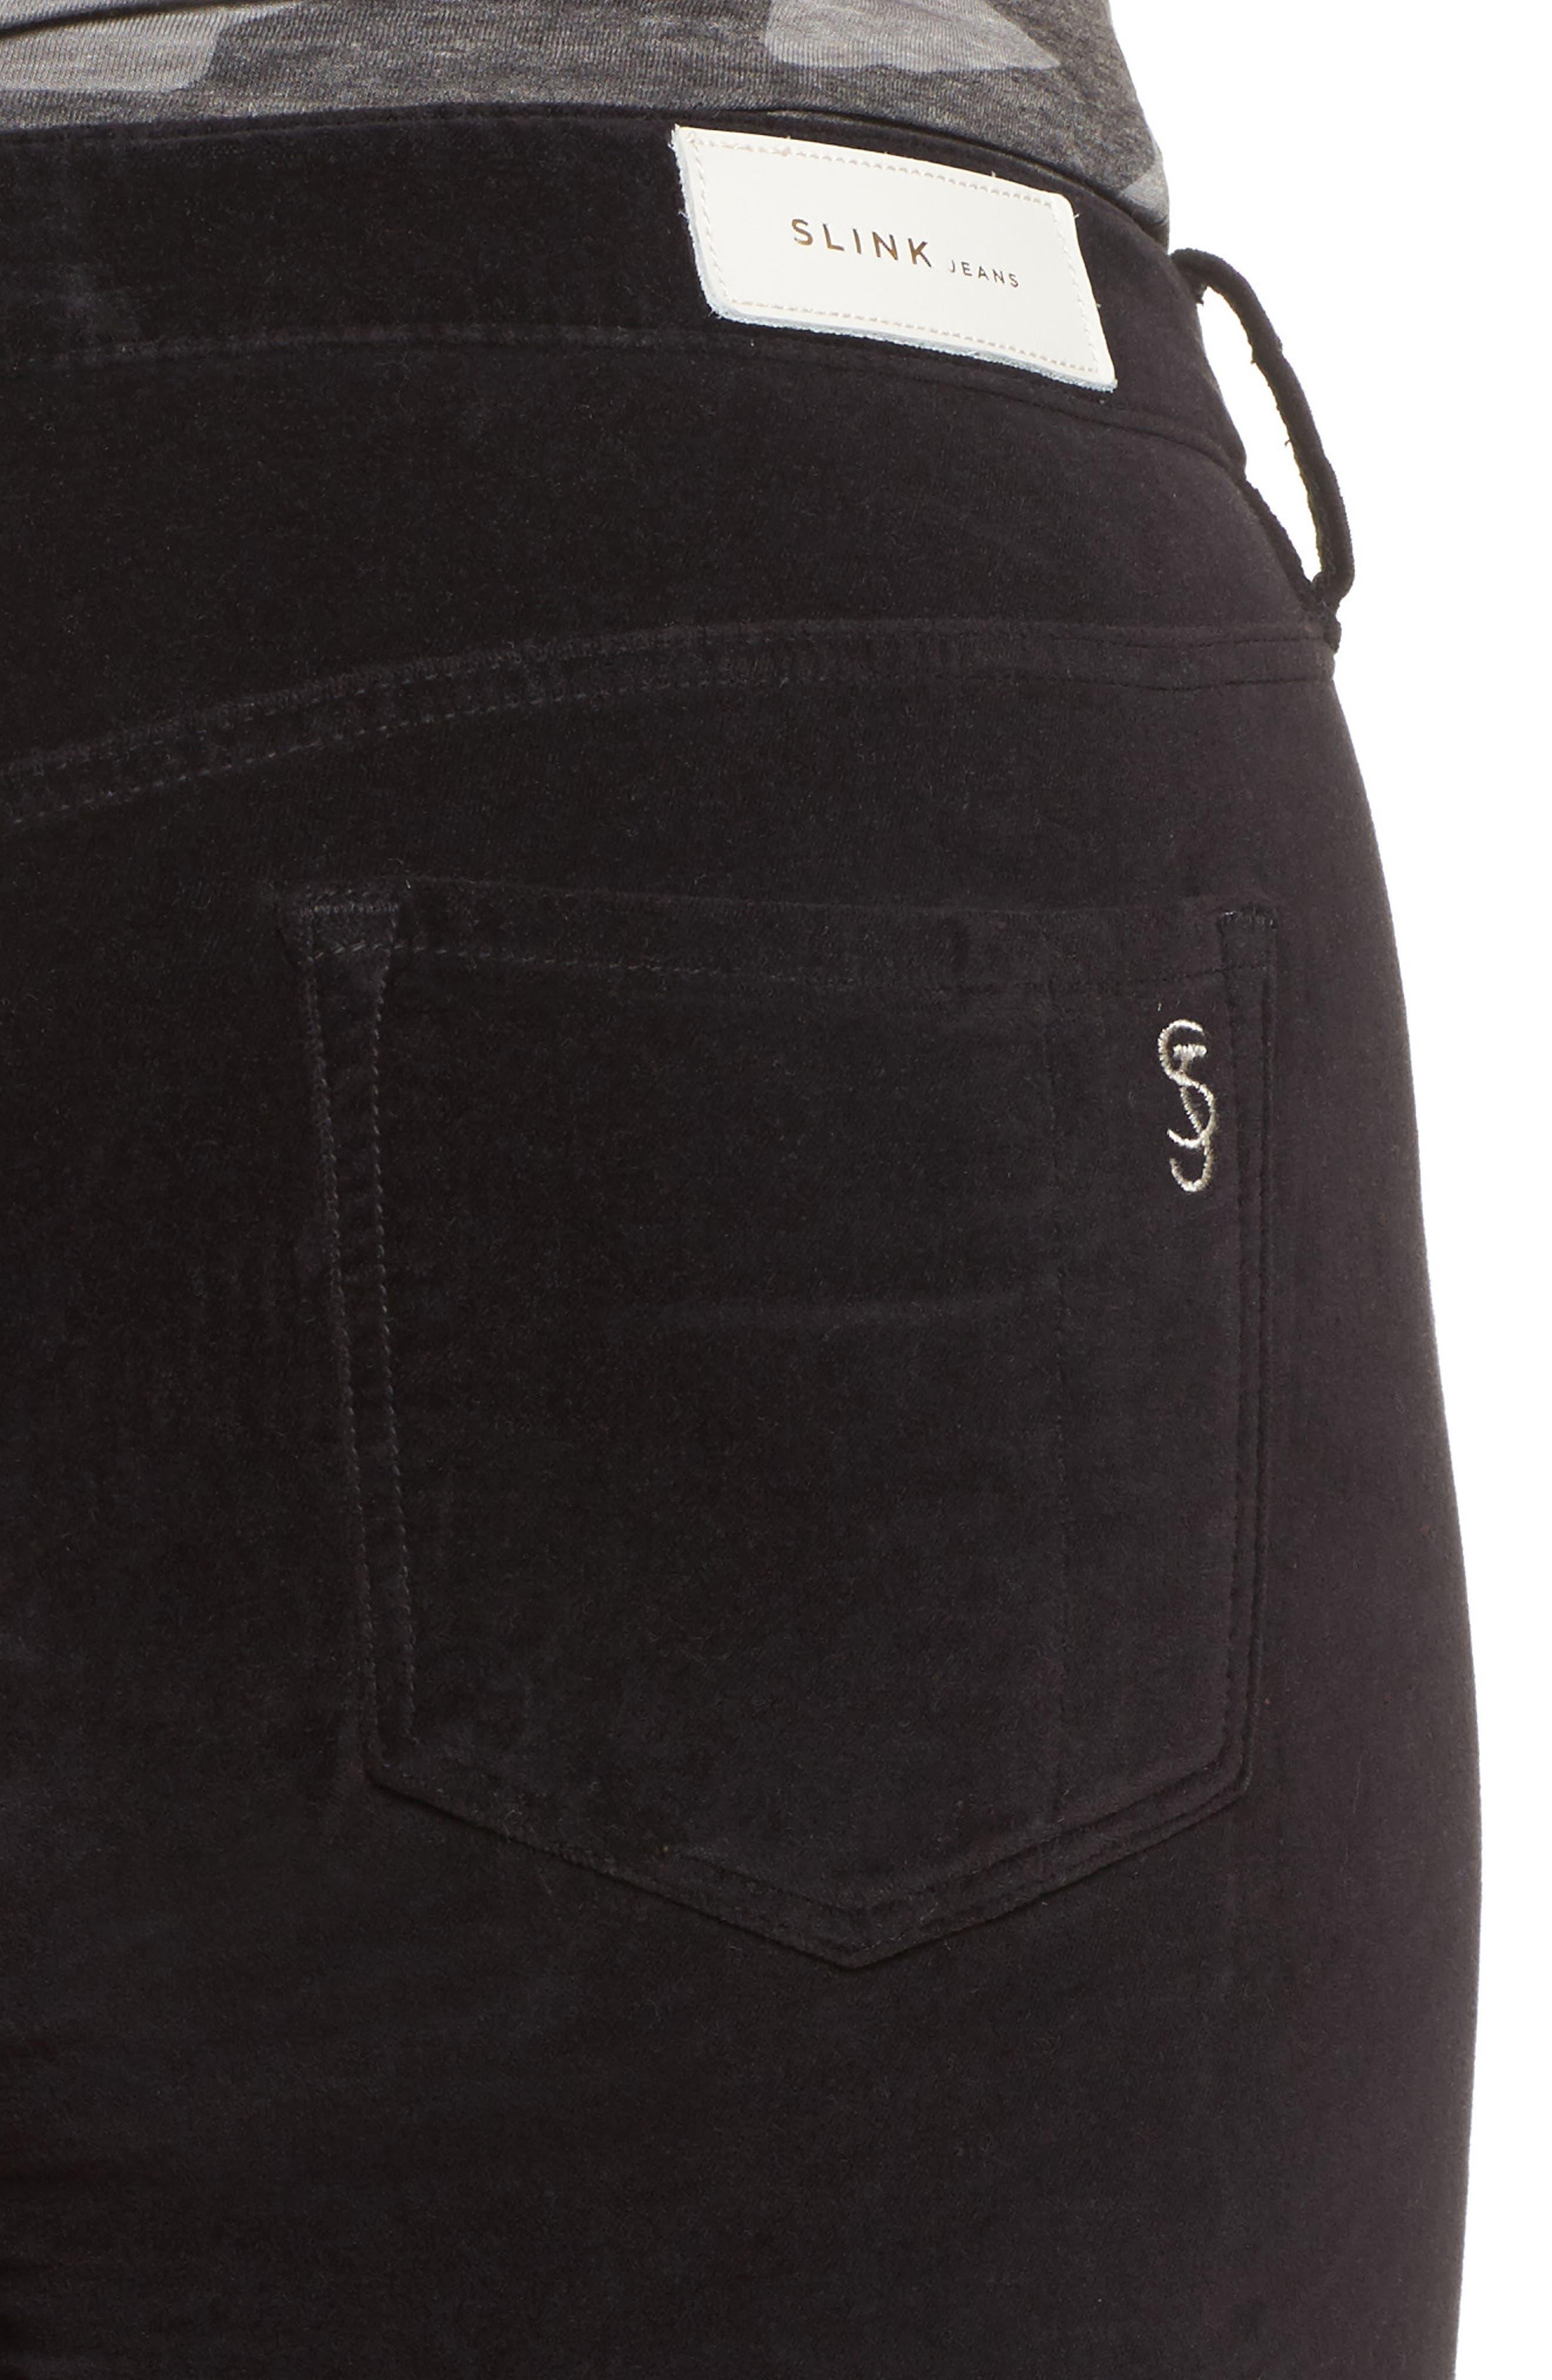 Alternate Image 4  - SLINK Jeans Velvet Skinny Ankle Jeans (Plus Size)